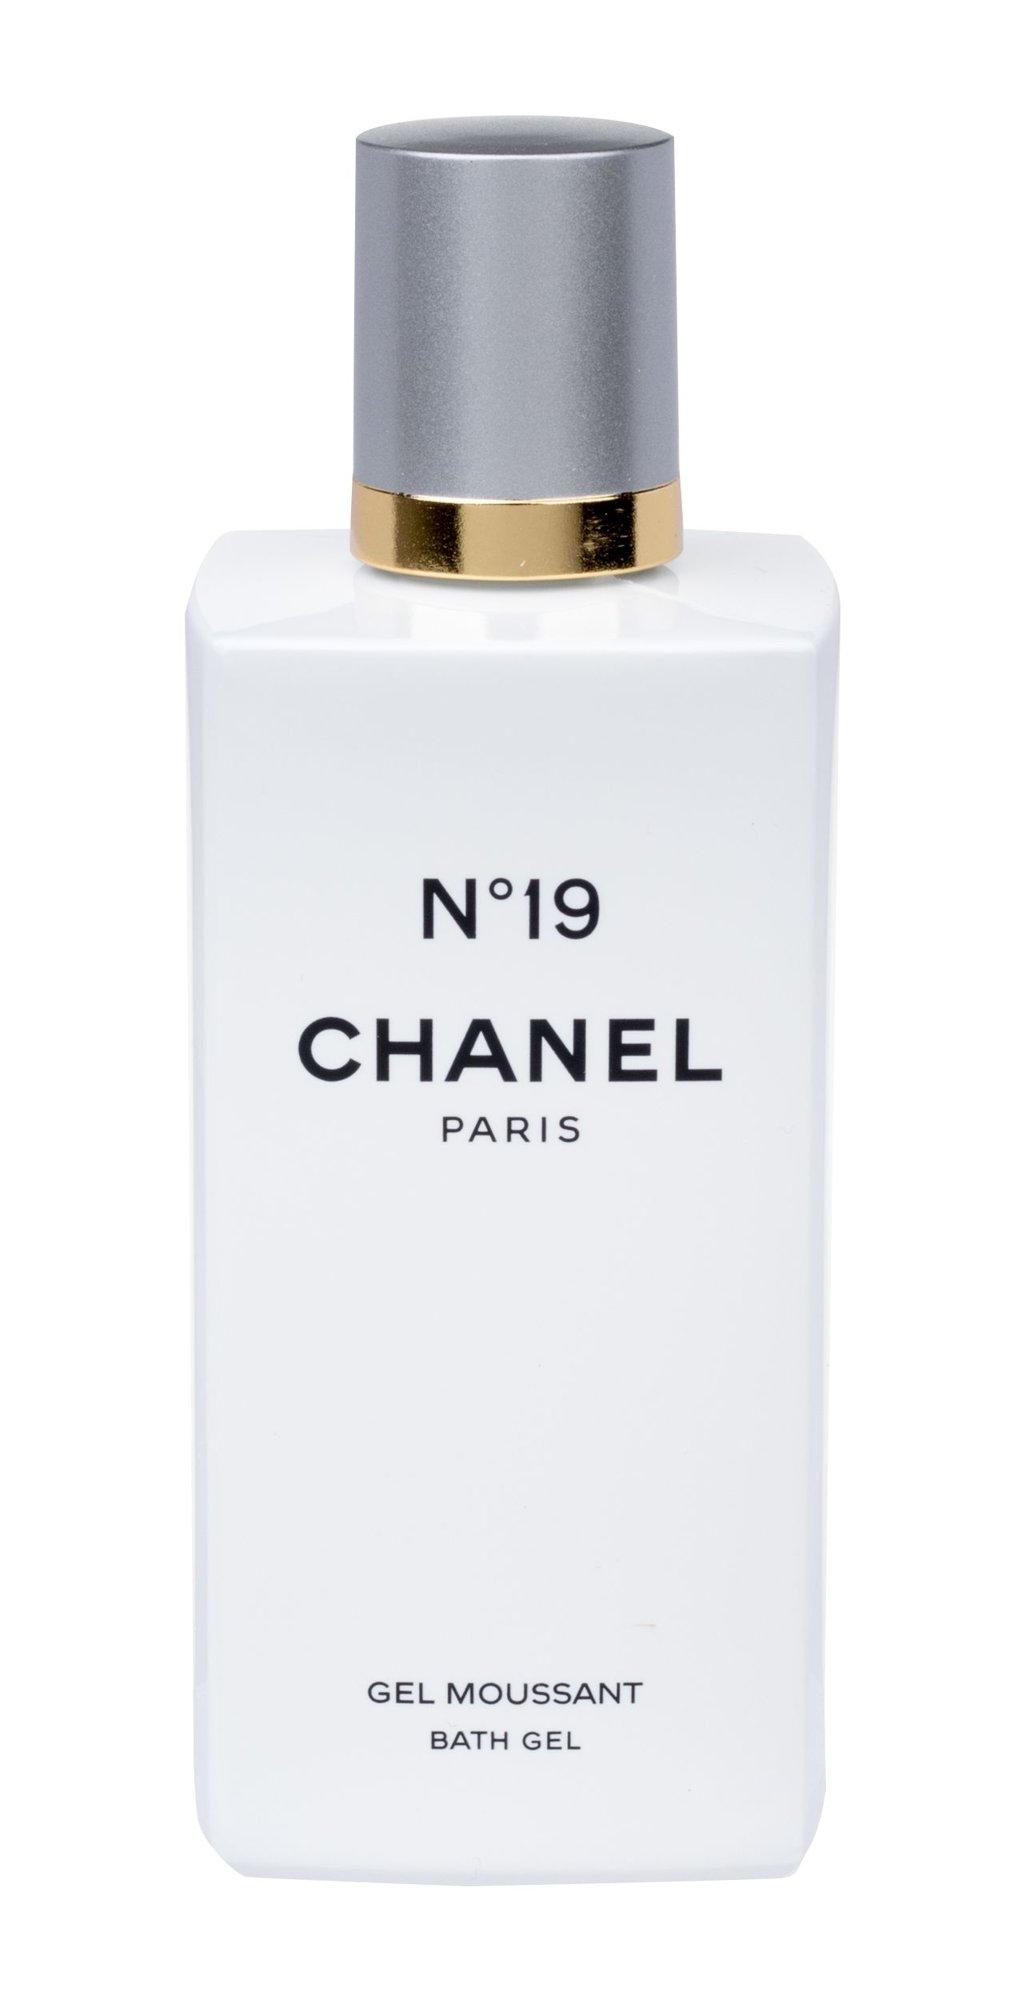 Chanel No. 19 Shower Gel 200ml